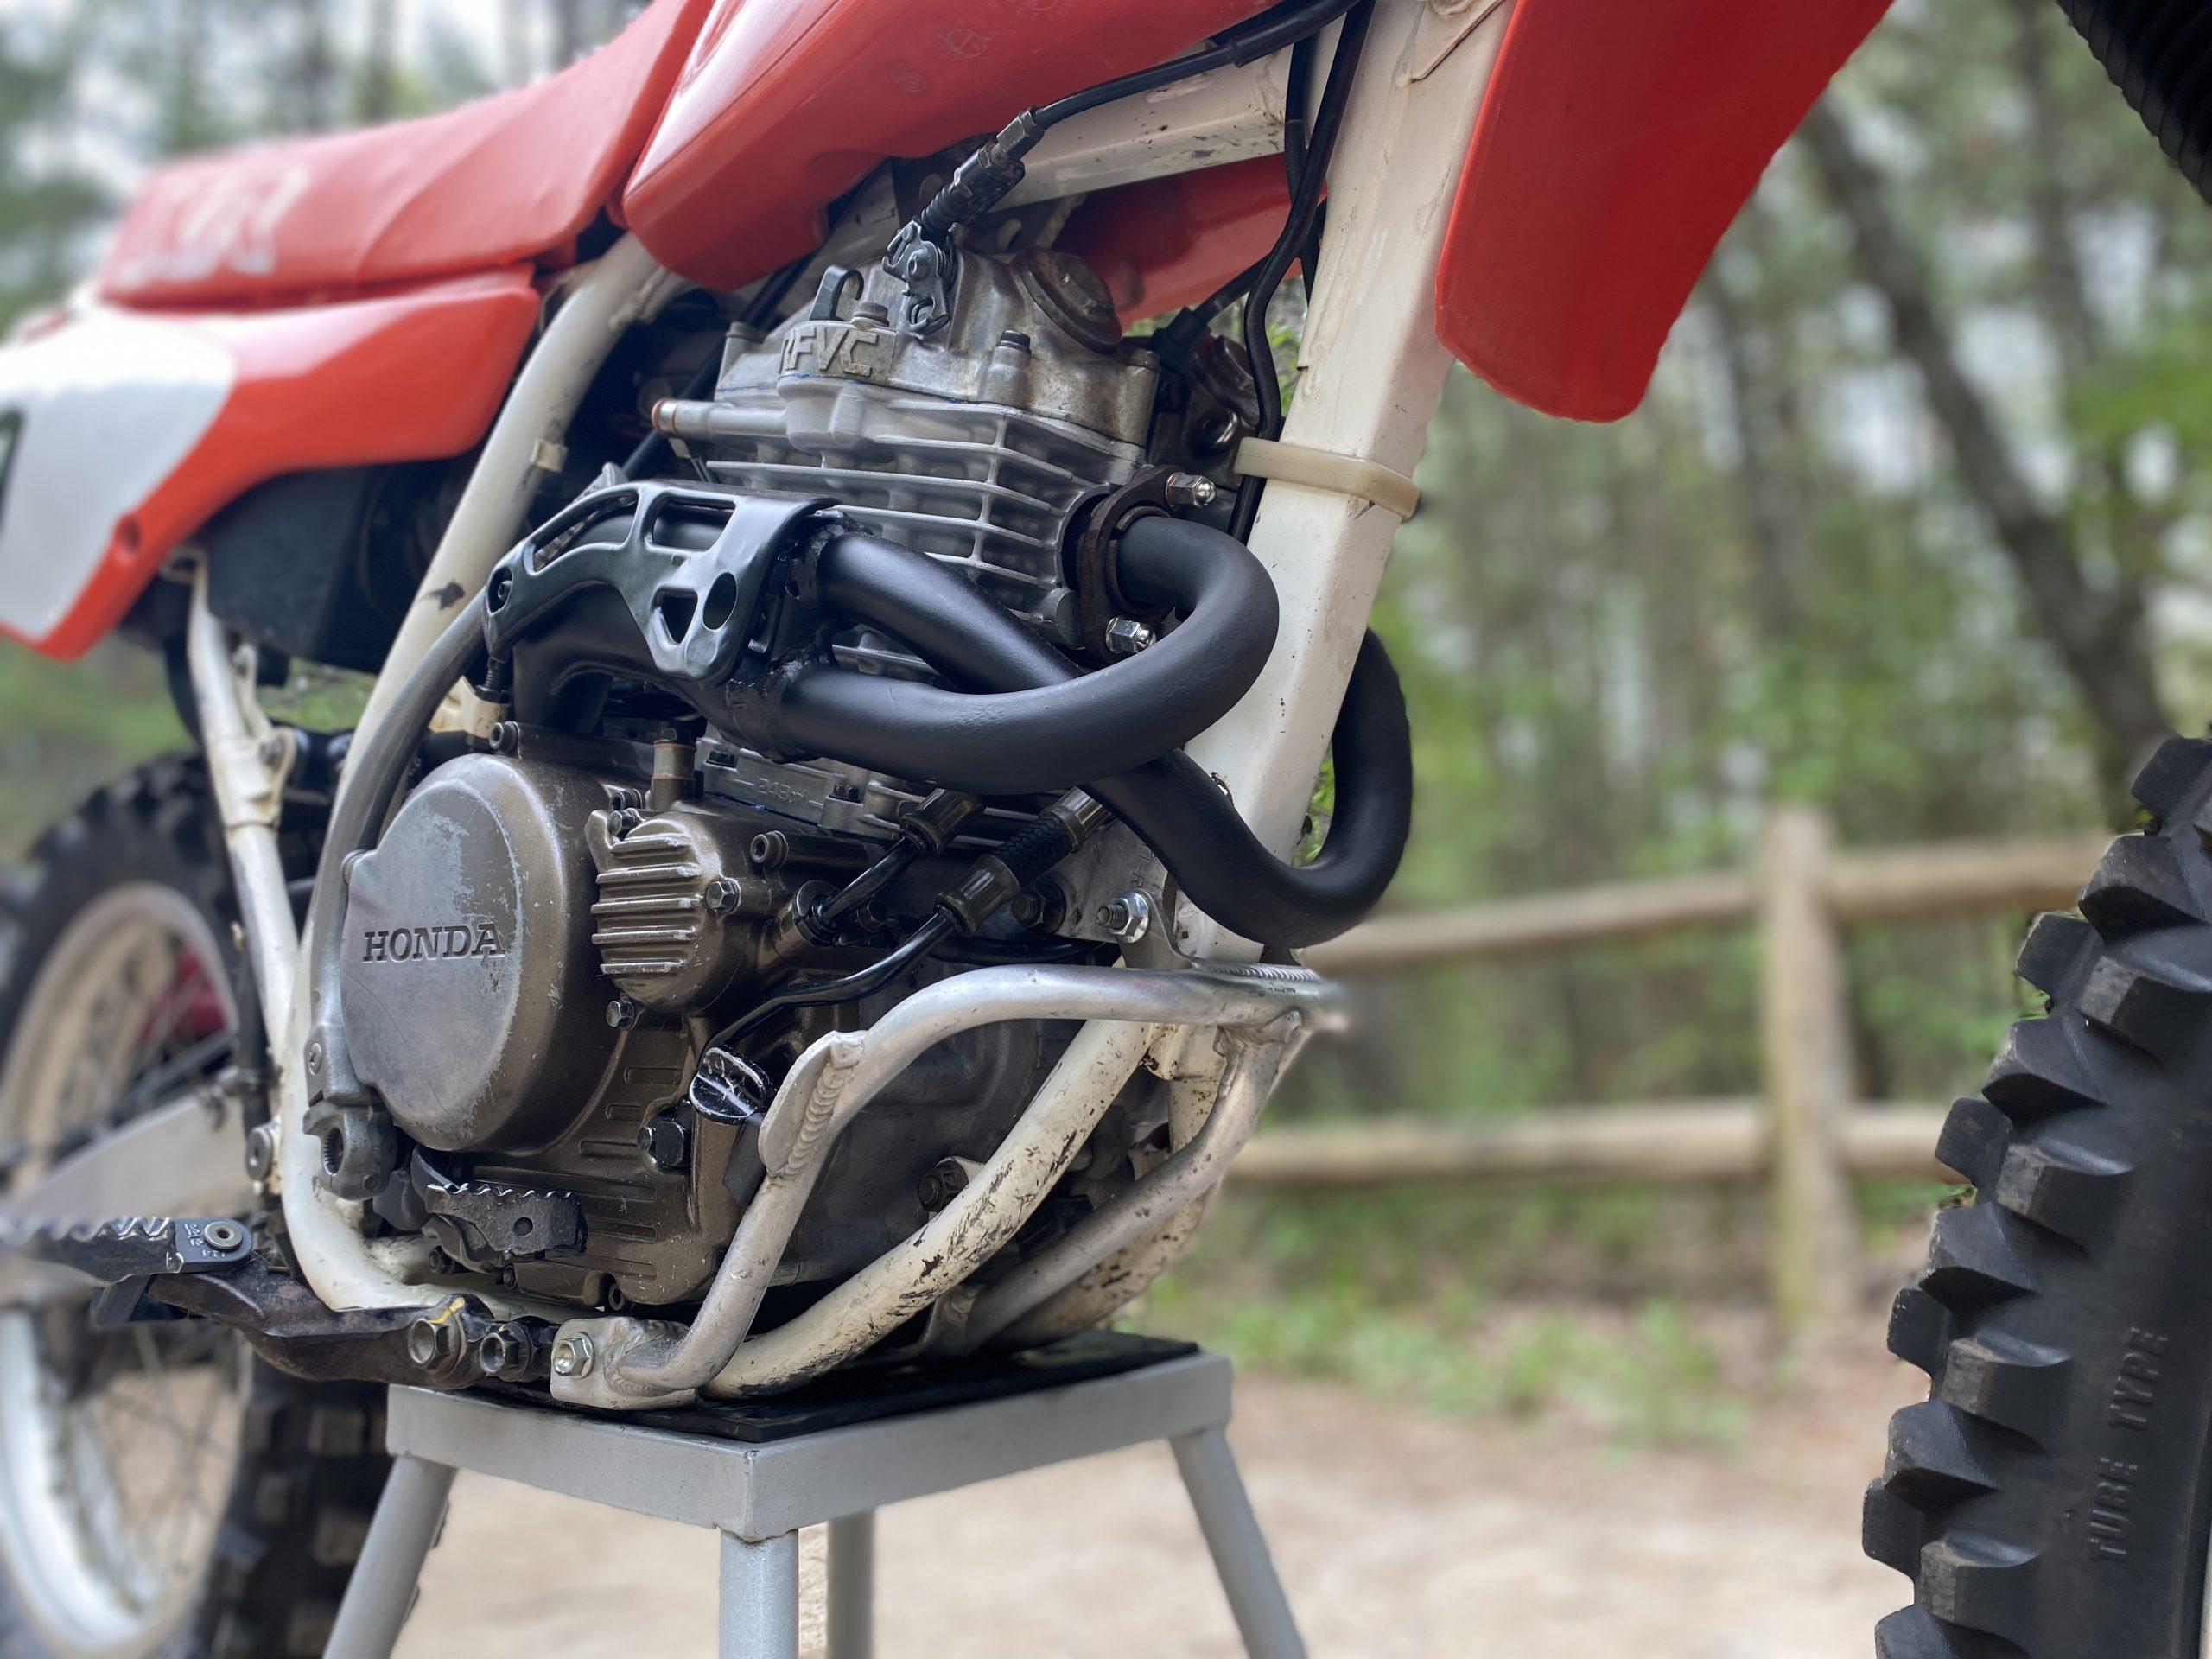 Honda XR250 engine completed